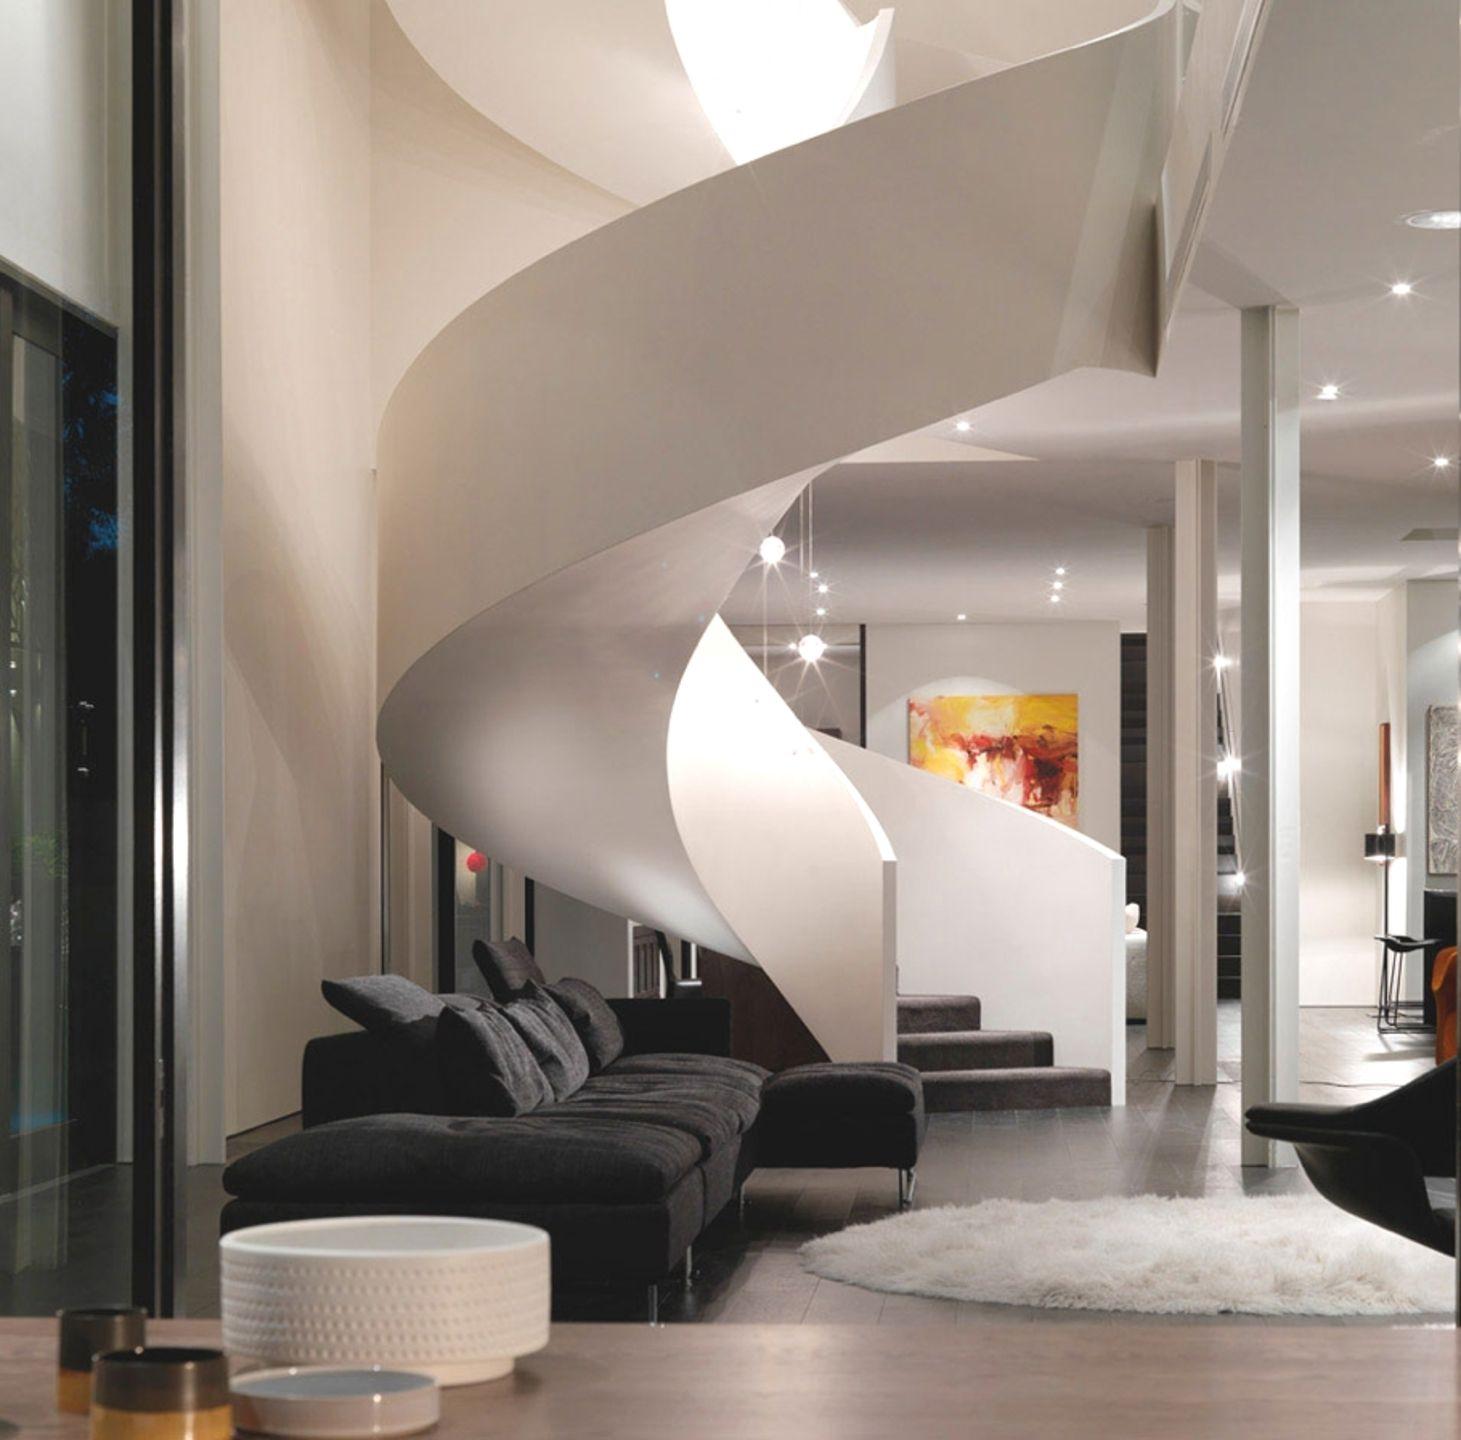 Modern luxury homes interior - Modern Luxury Interior Design Ideas Luxury Homes L Luxury Residences Luxuryhomes Lhomes